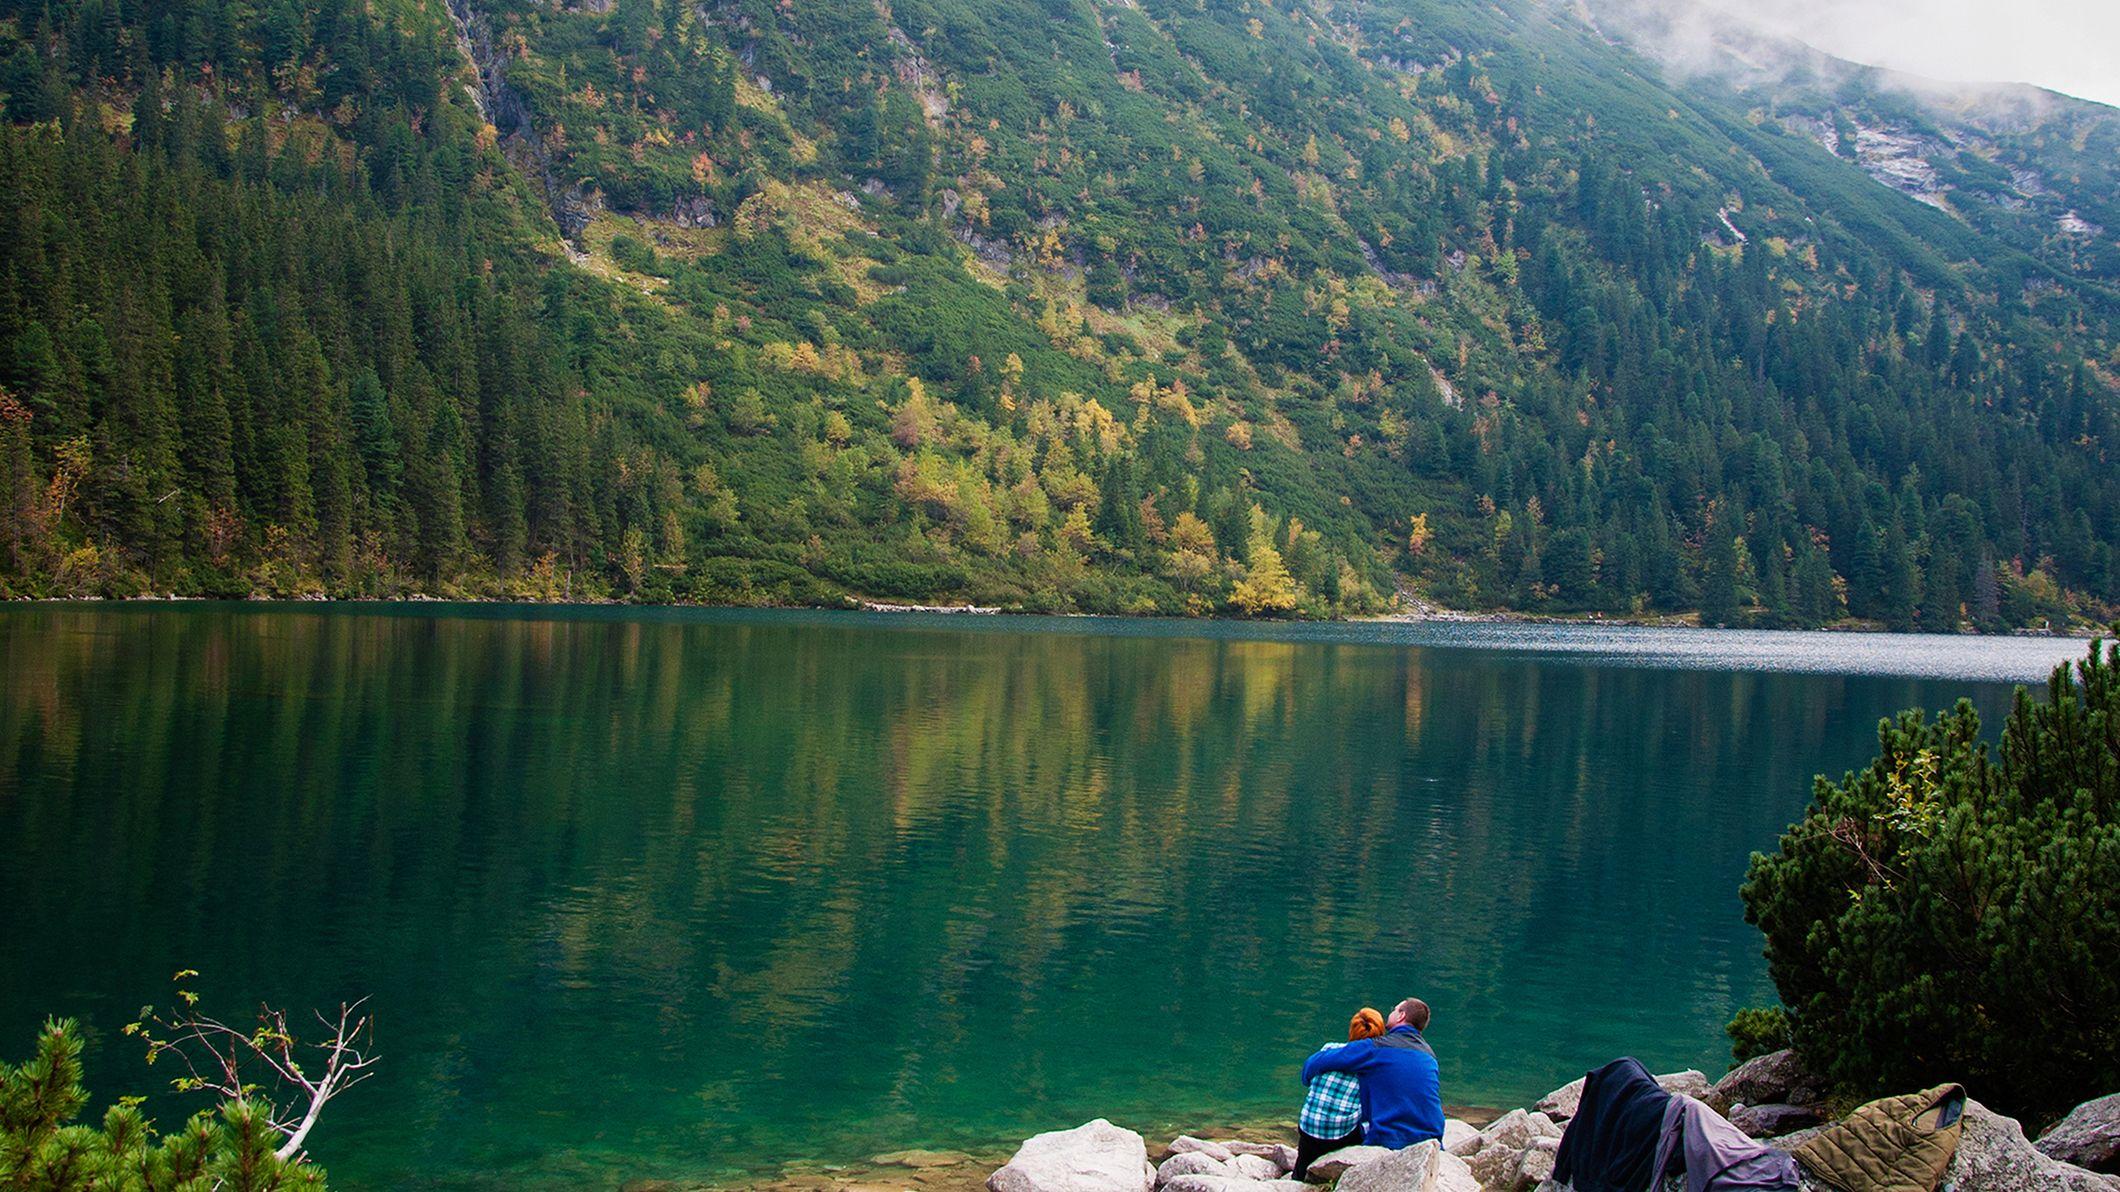 Vacations AllInclusive LastMinute Travel Deals  Last